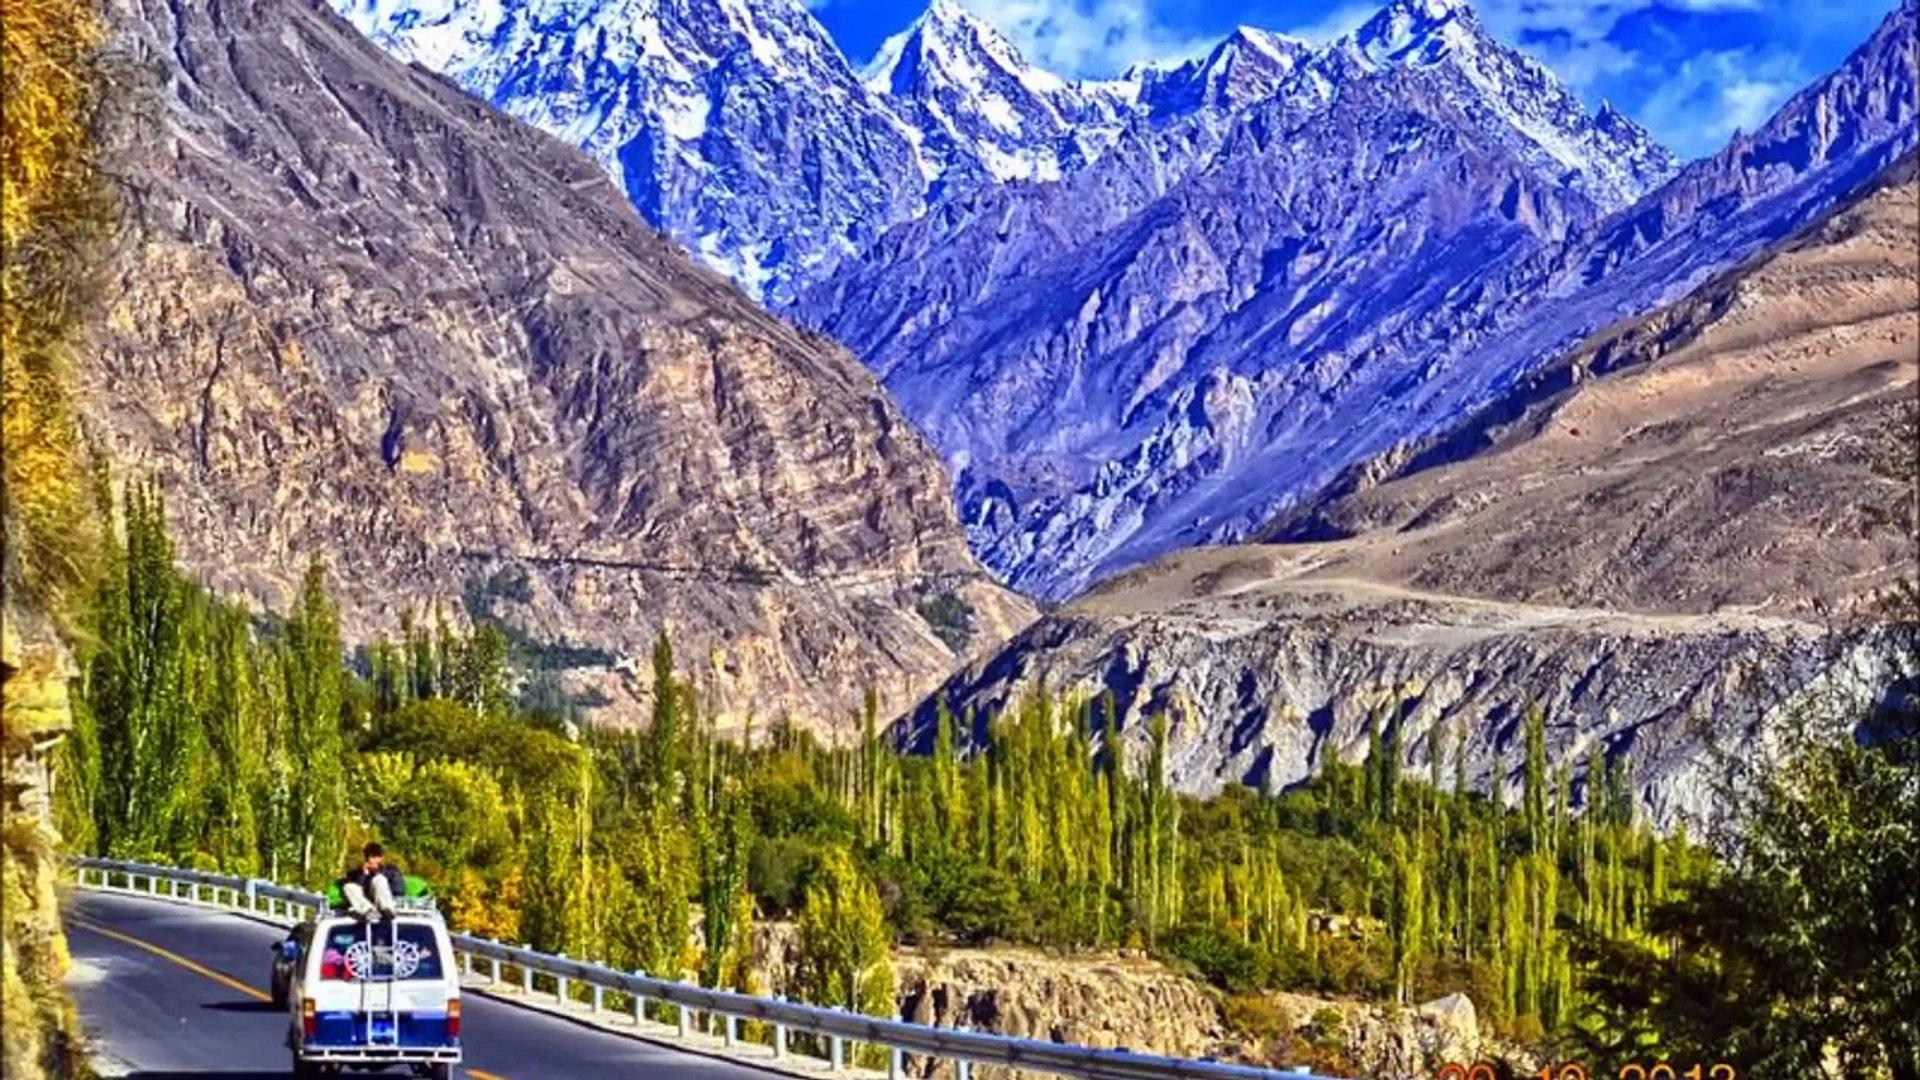 Top 10 beautiful places in pakistan | Beautiful places | Pakistan top 10